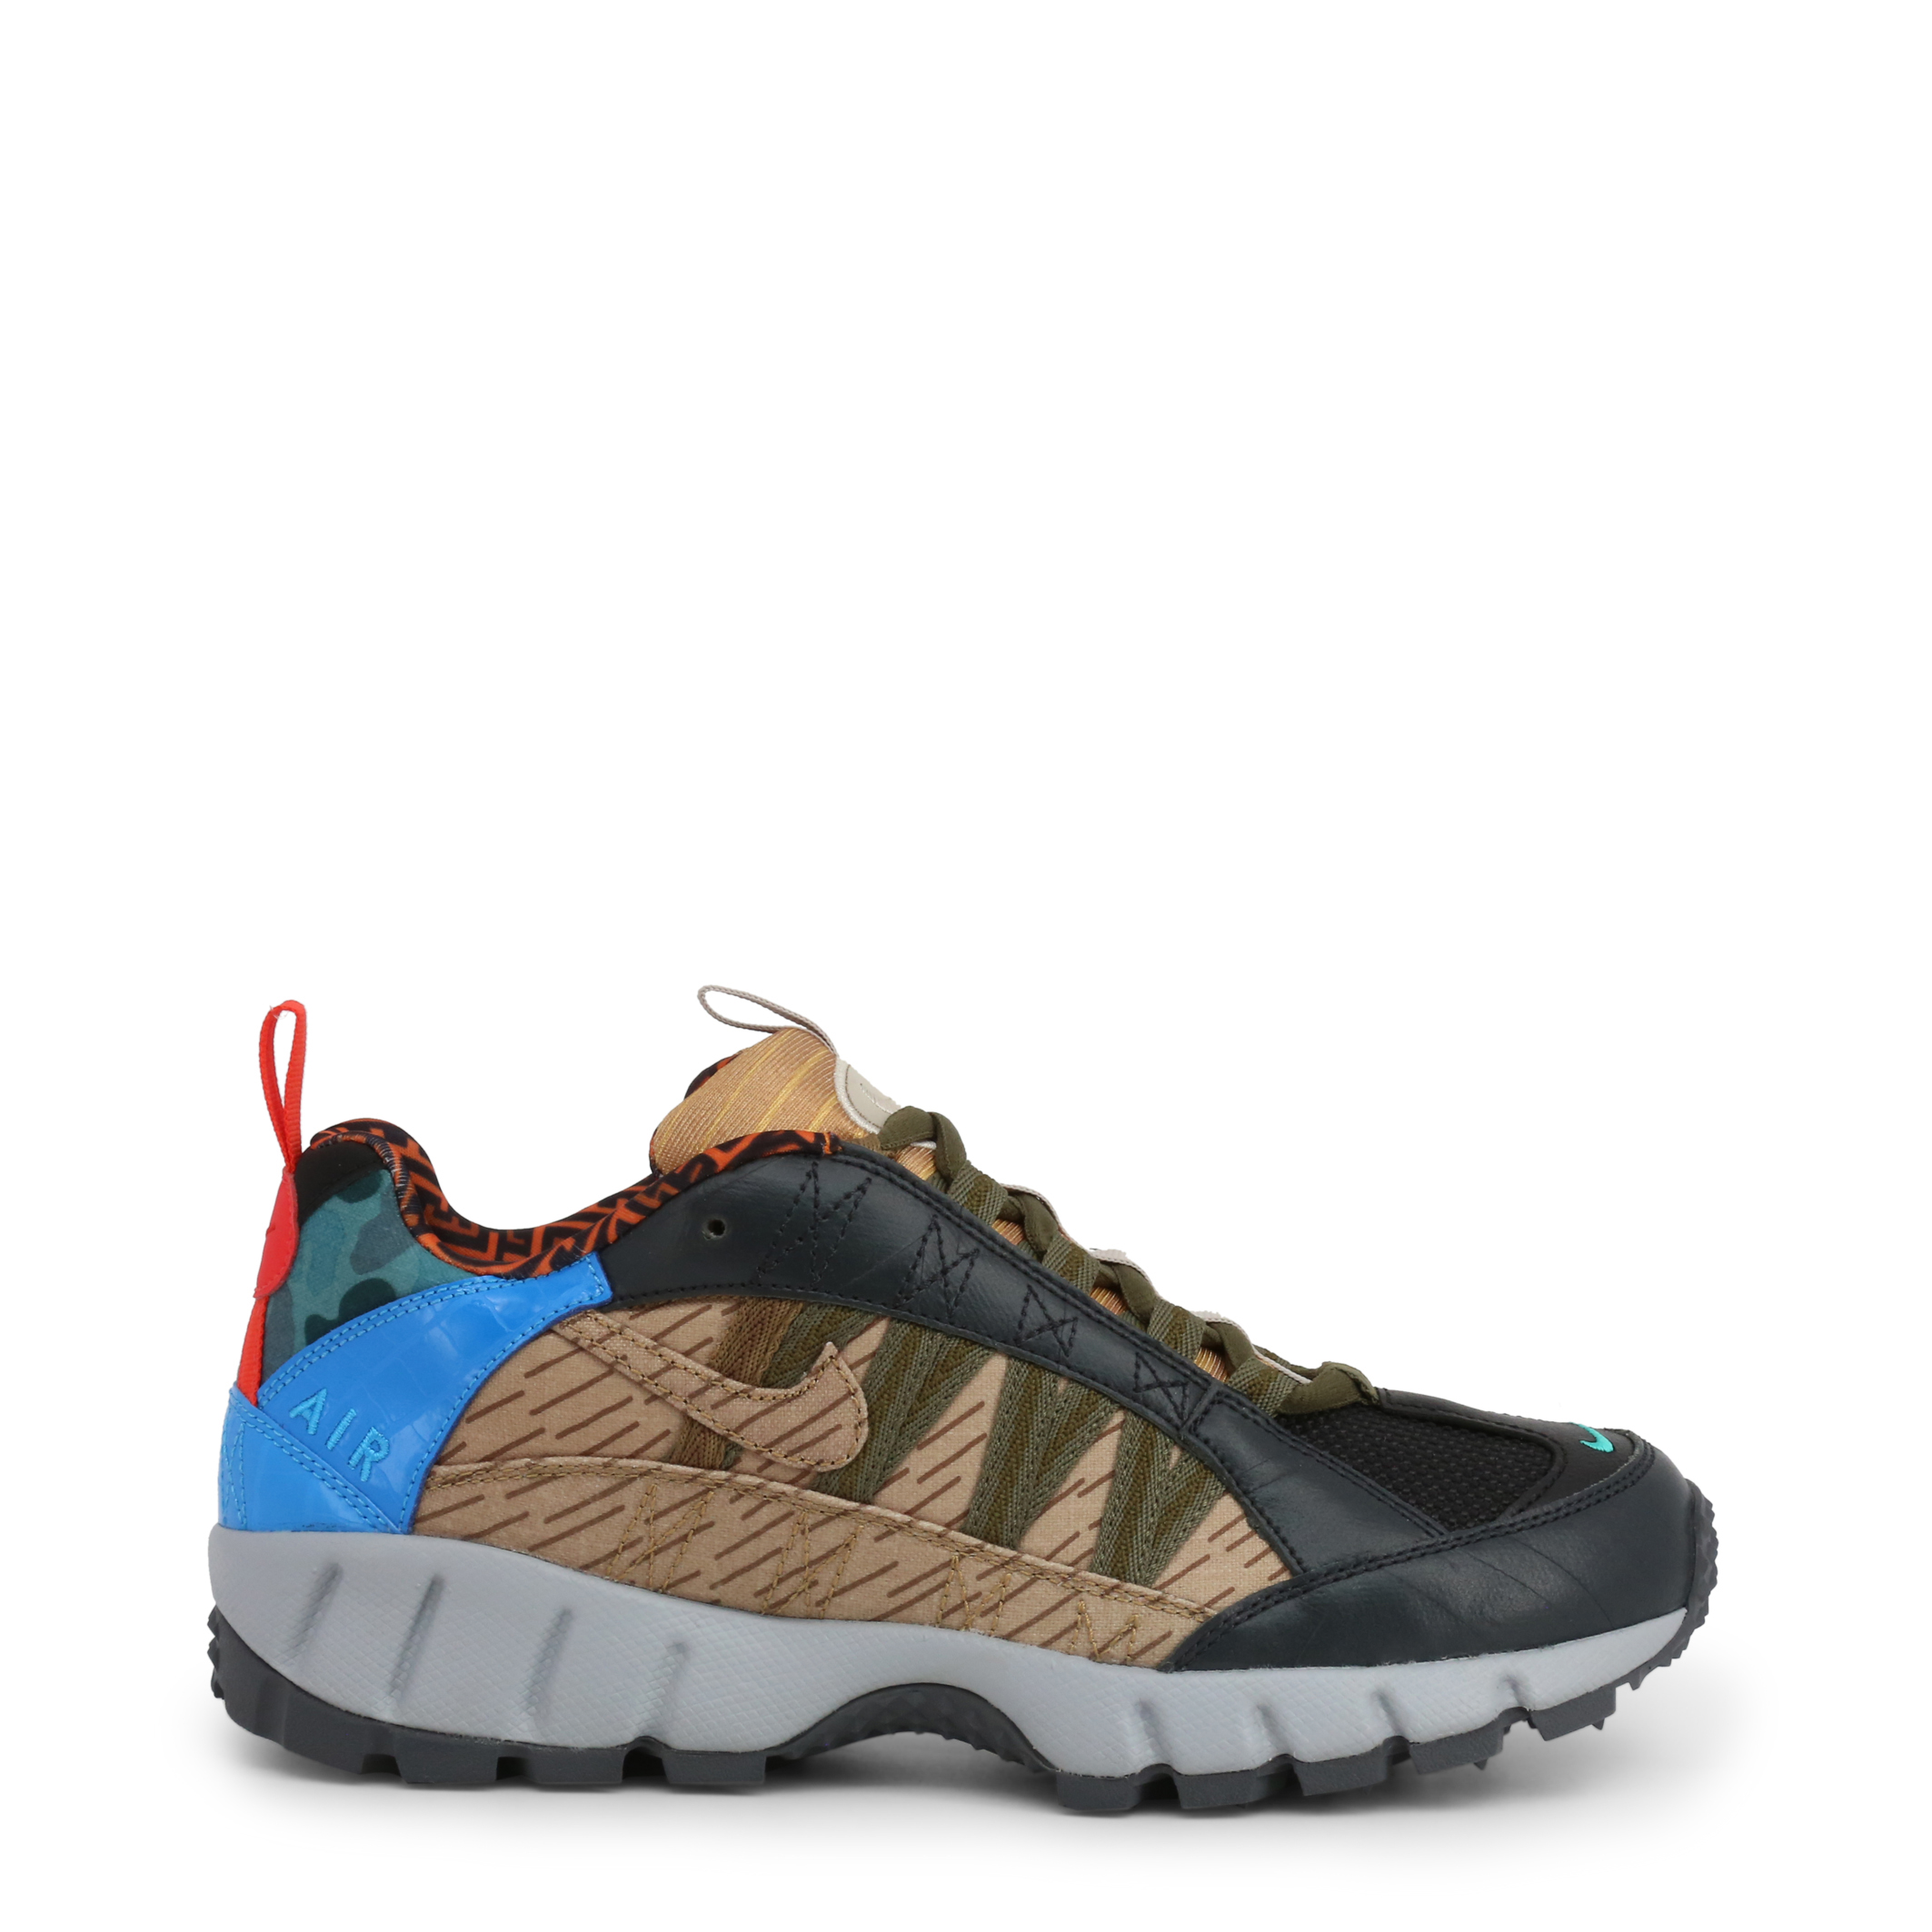 103703-643120-Nike-Air-Humara17Premium-Uomo-Nero-103703